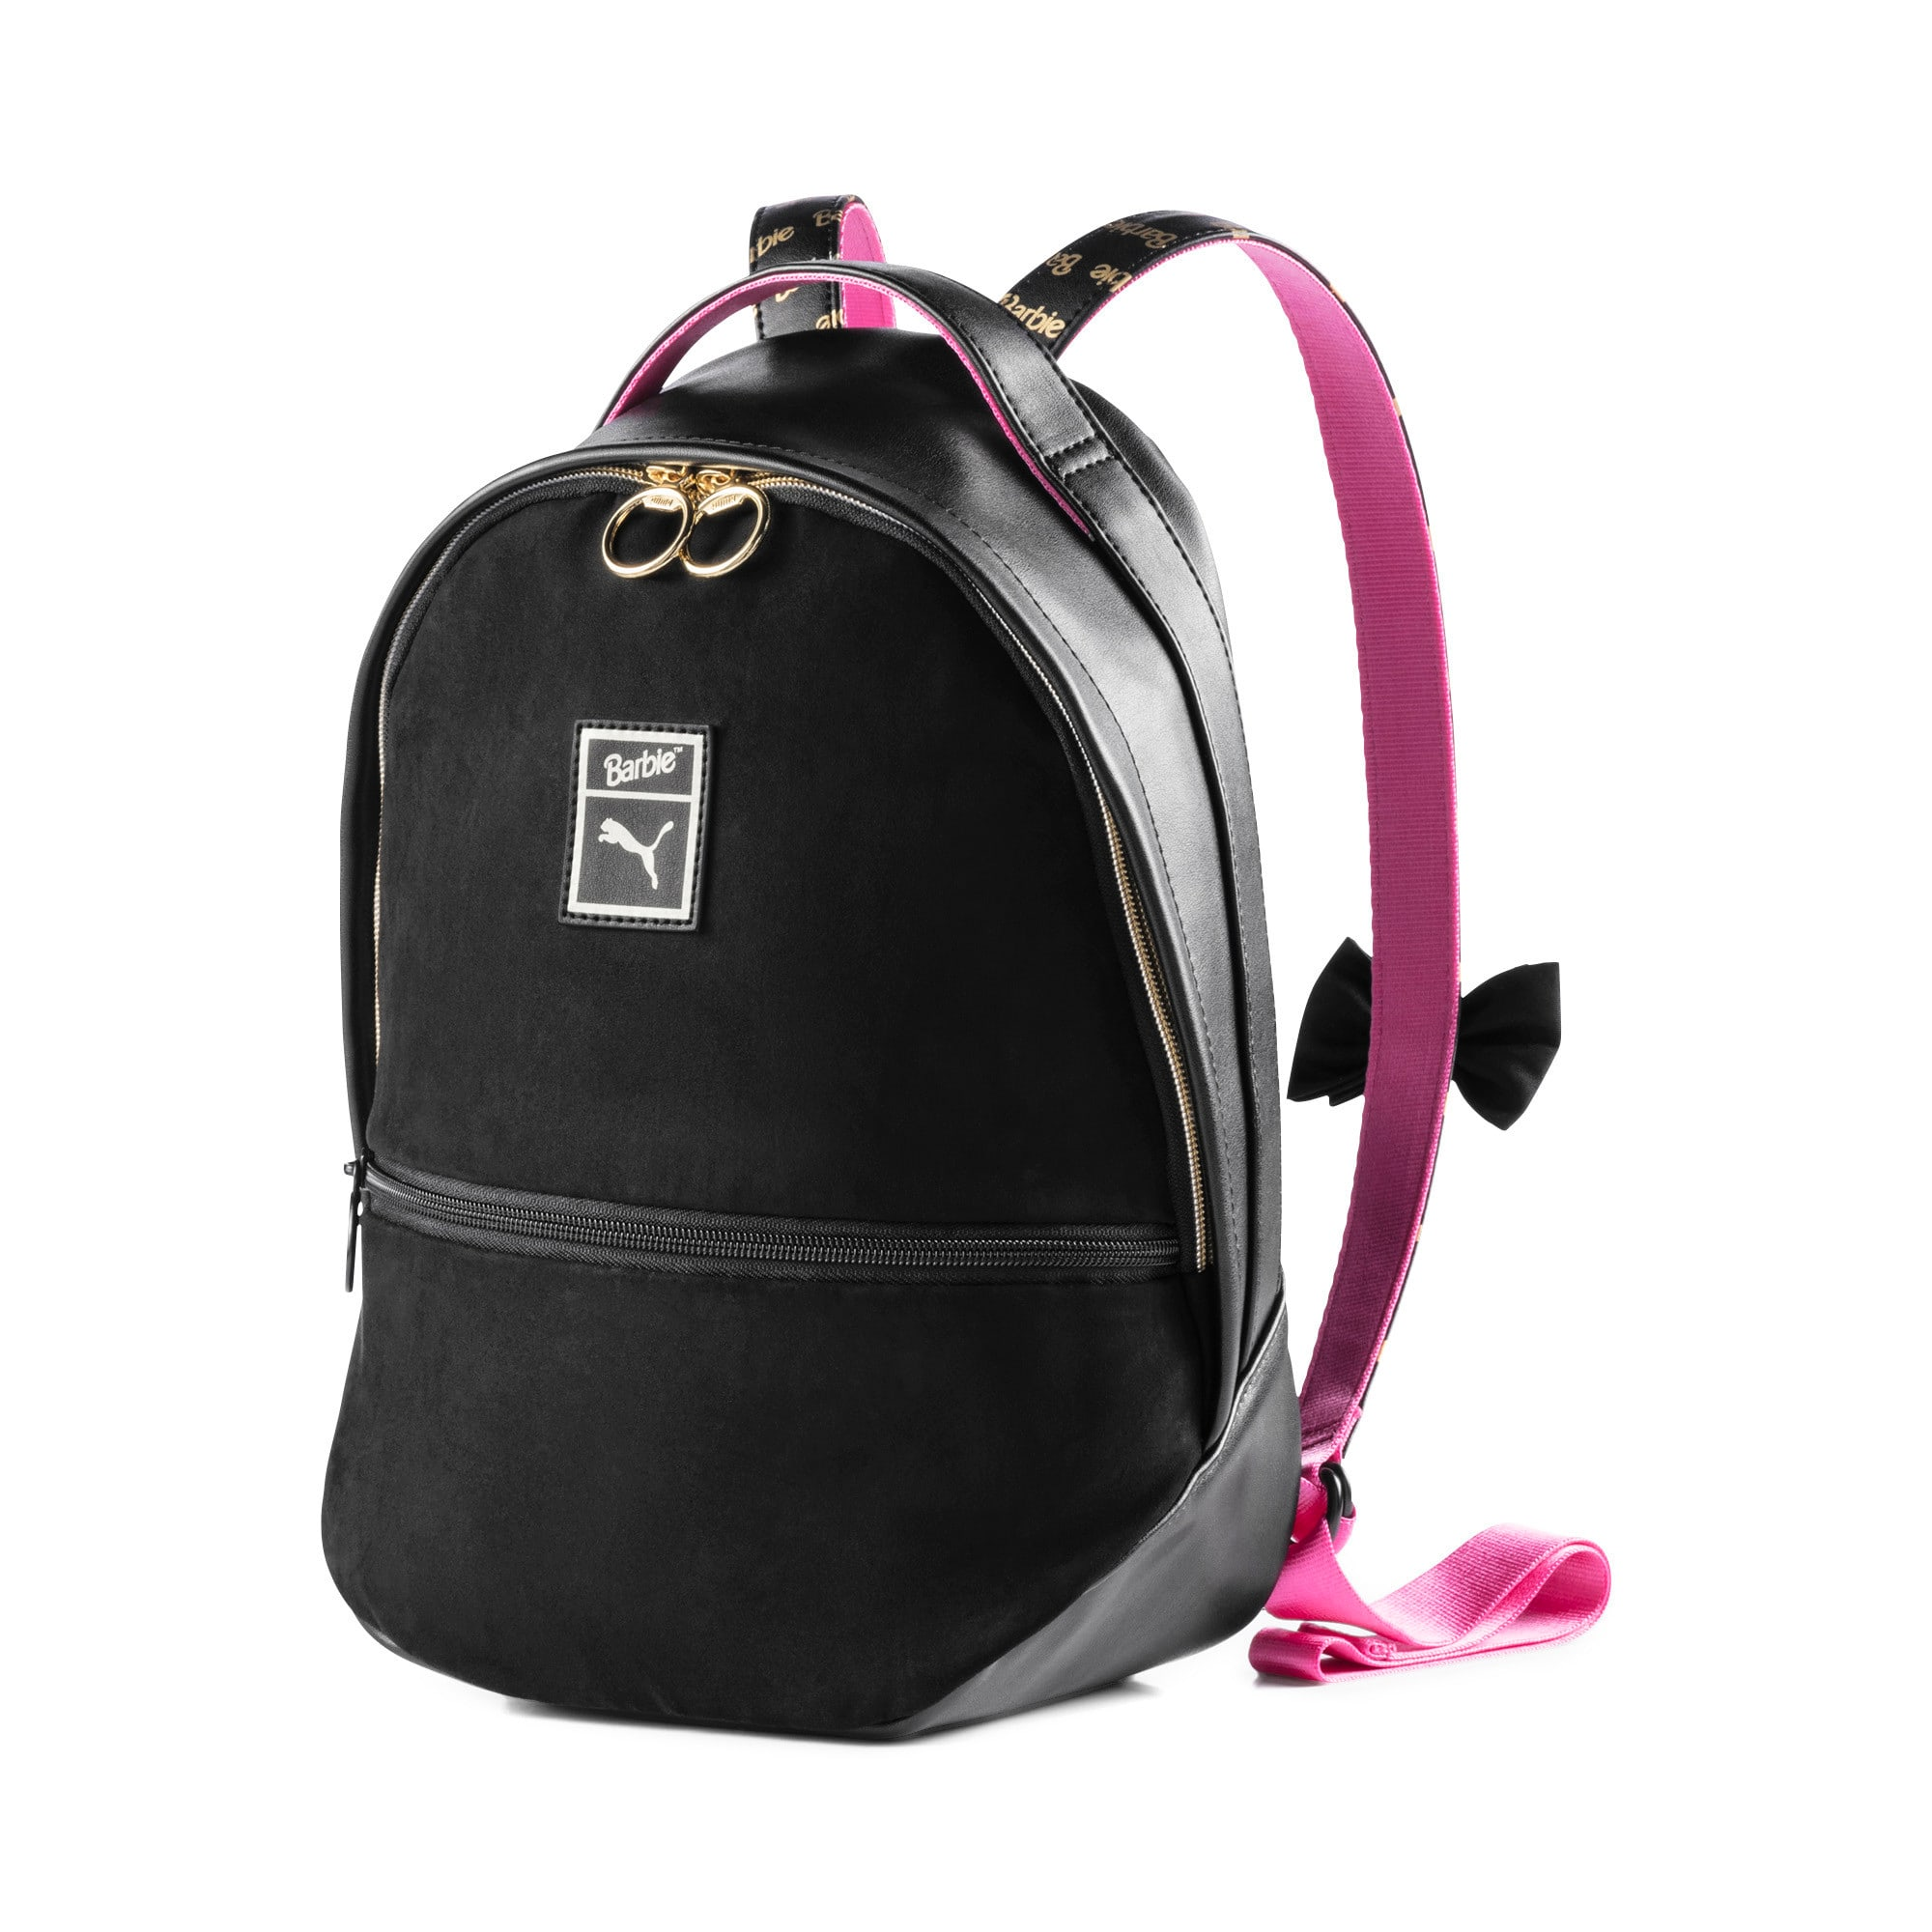 Thumbnail 1 of PUMA x BARBIE Backpack, Puma Black, medium